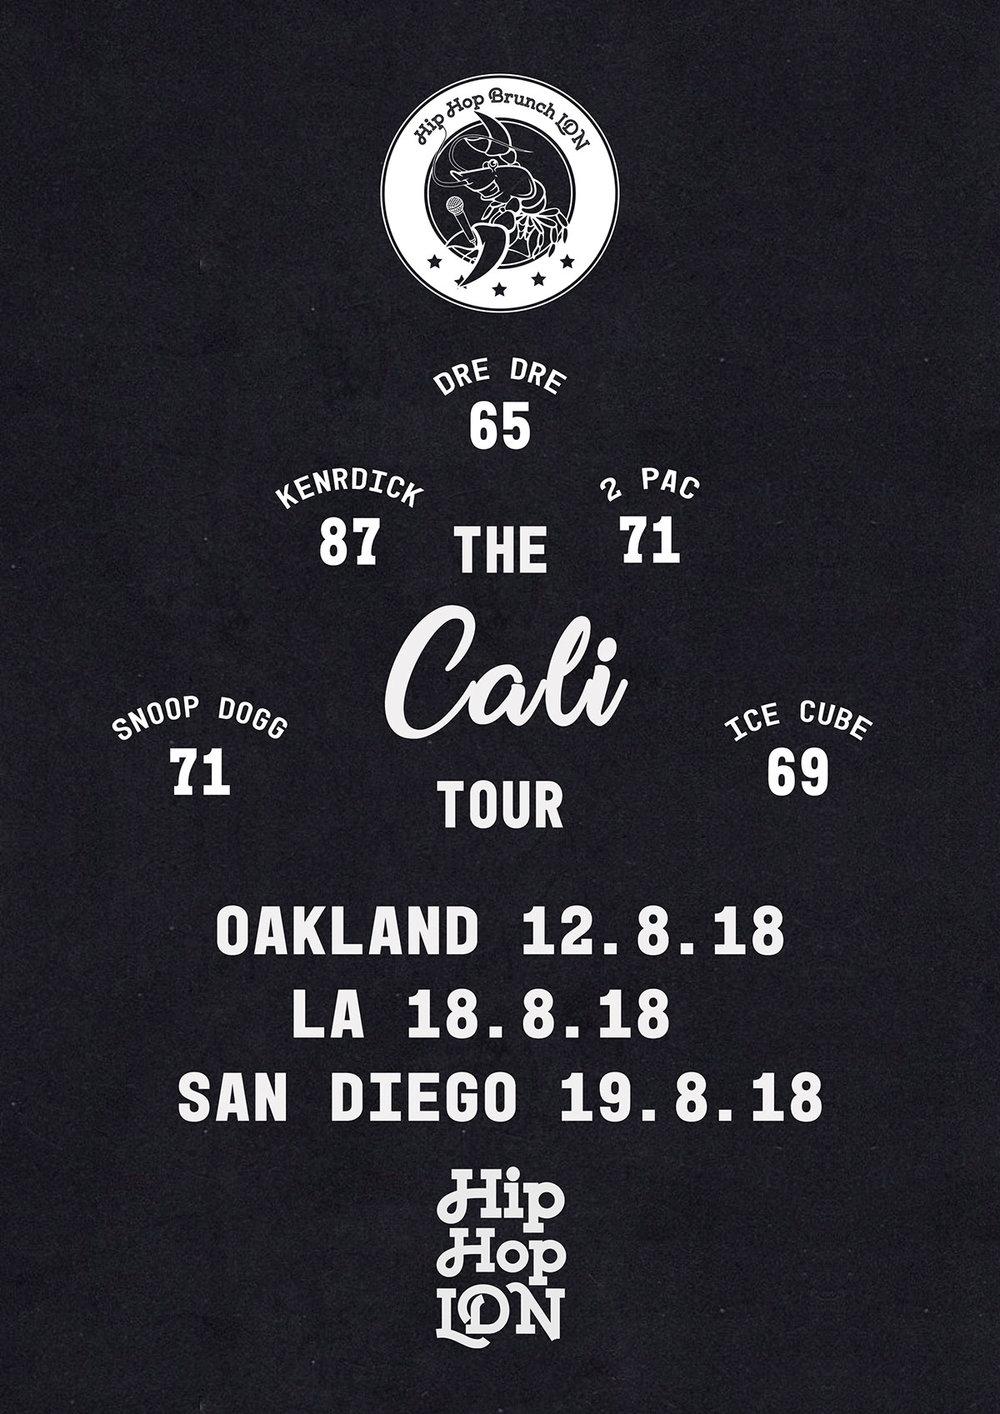 Cali-tour.jpg